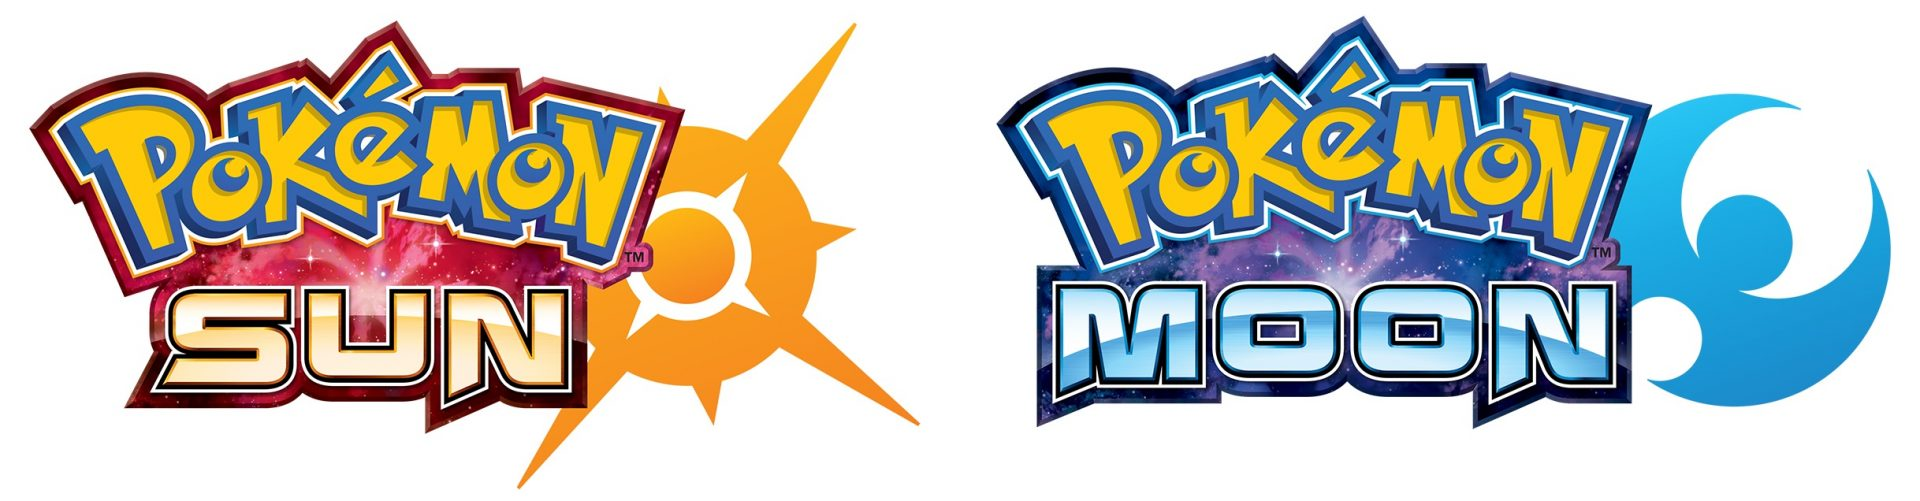 E3 2016: More Pokémon and Info for Pokémon Sun and Moon